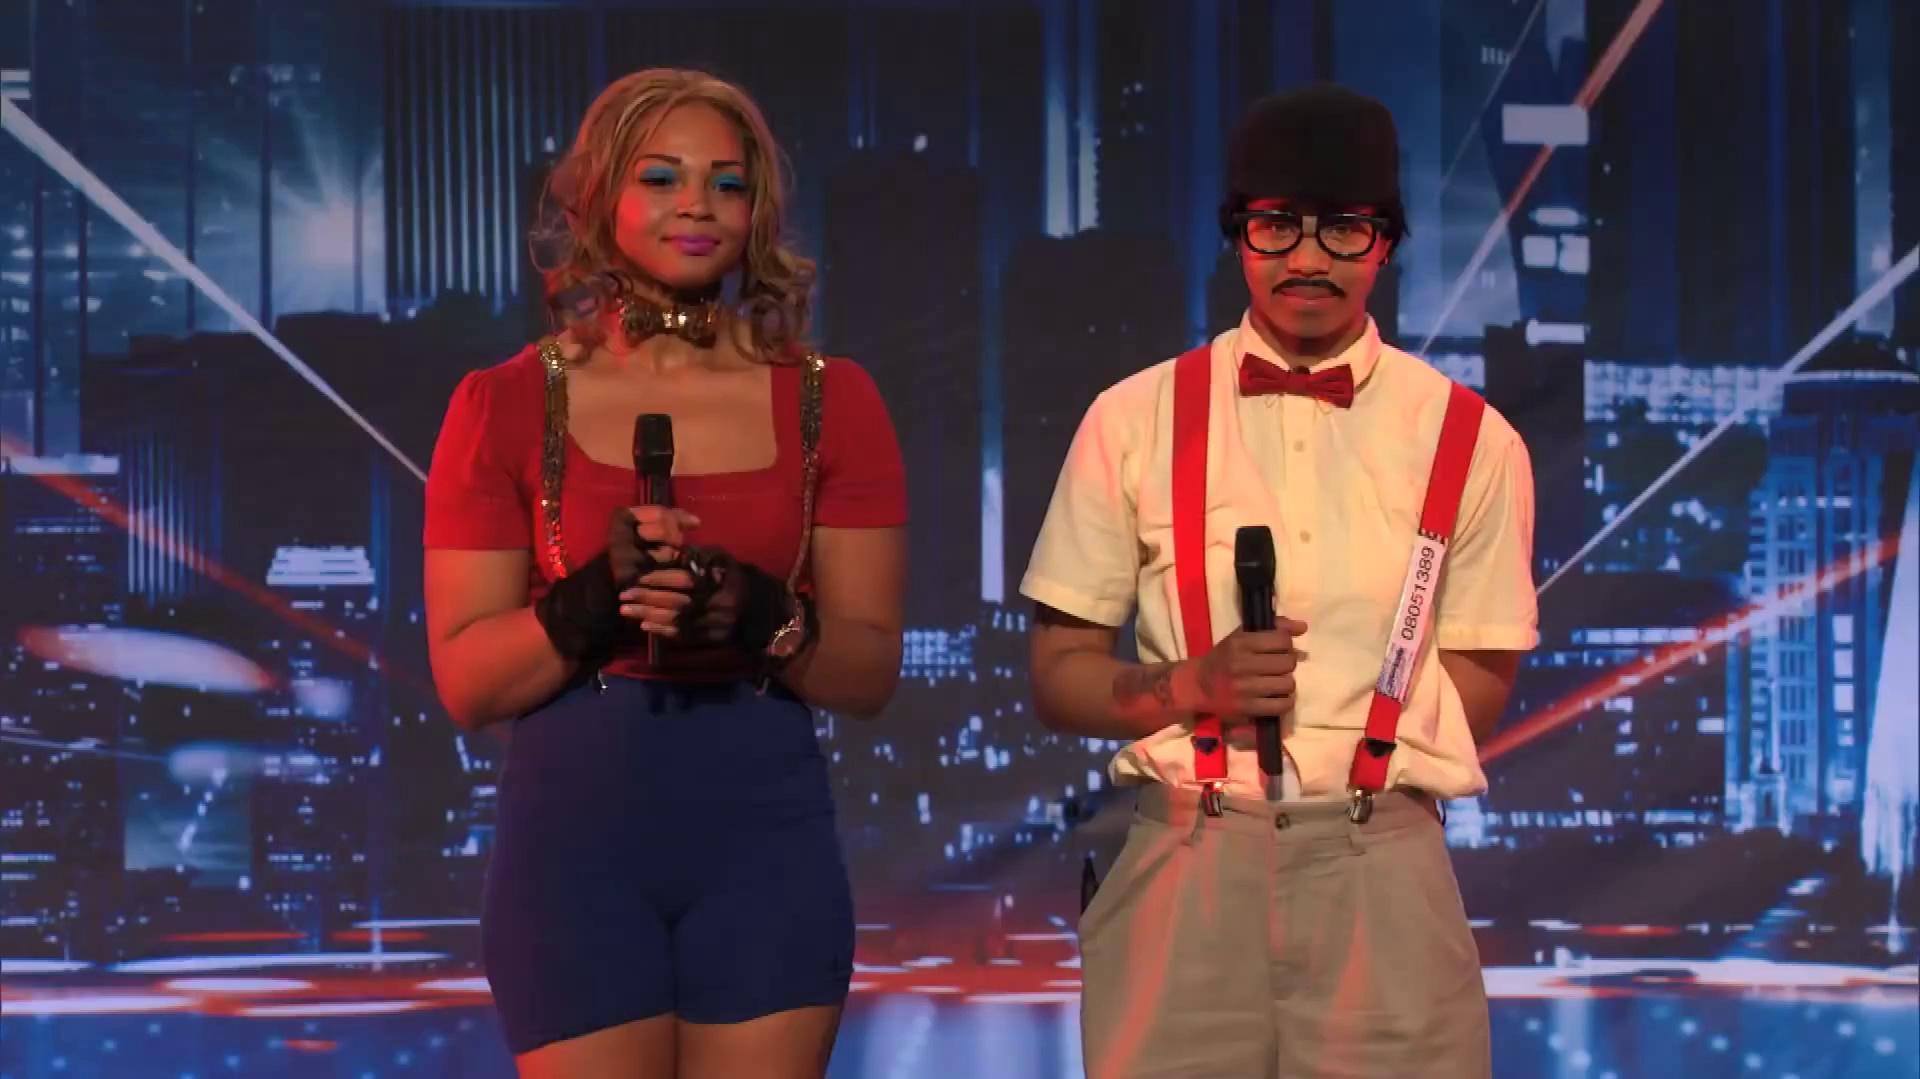 America's_Got_Talent_2013_-_Season_8_-_102_-_Distraxtion_-_Human_Like_Puppet_Act